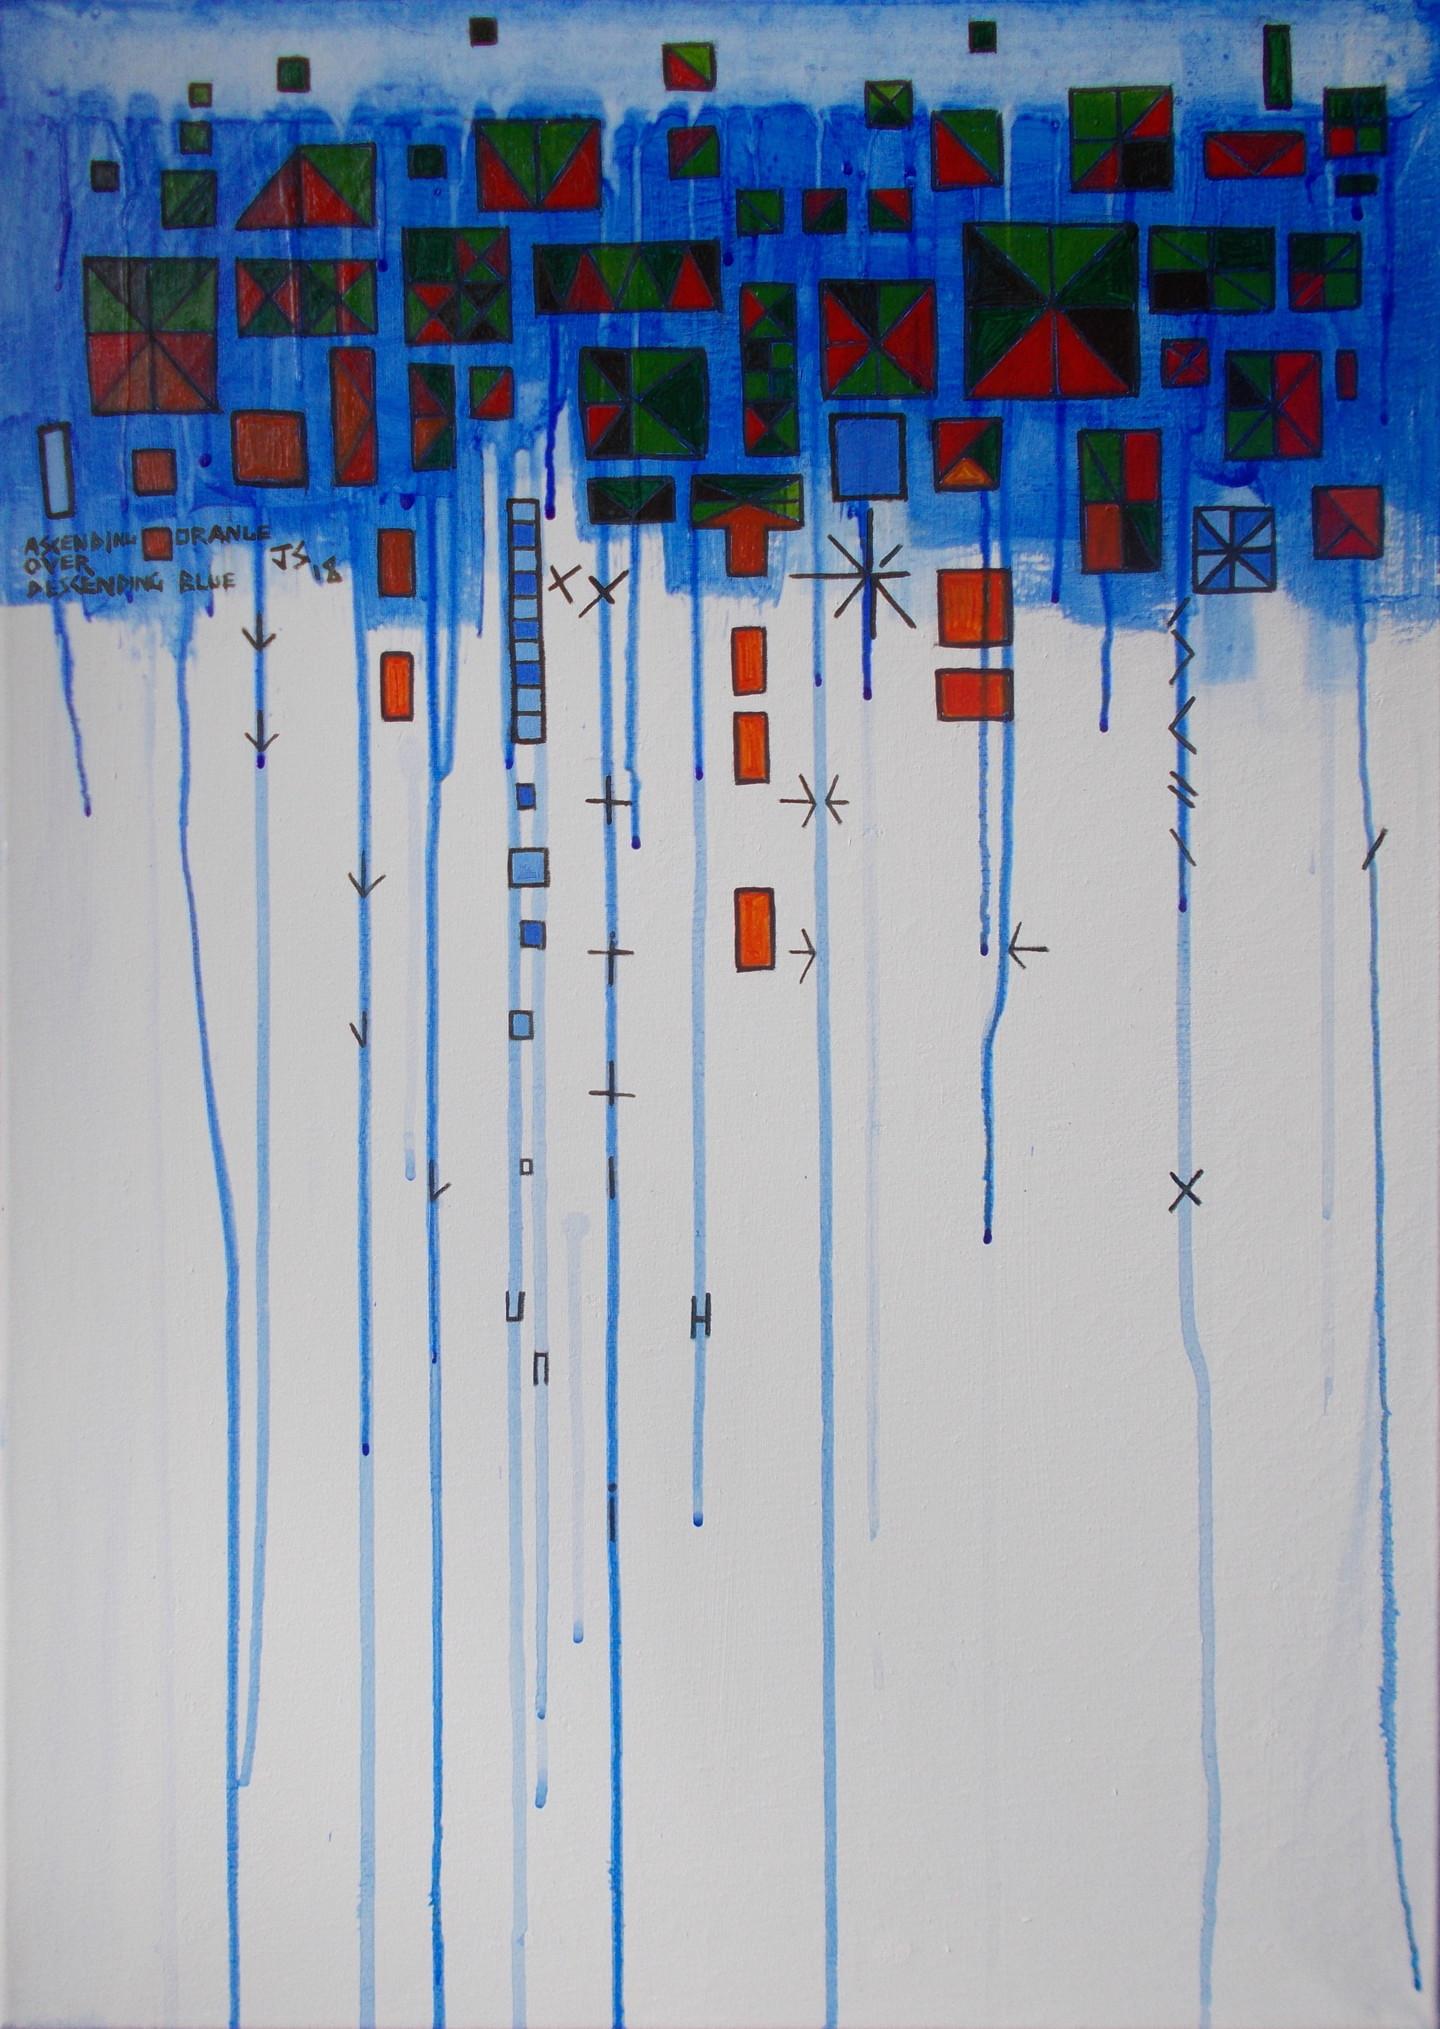 Gerald Shepherd - Ascending Orange Over Descending Blue